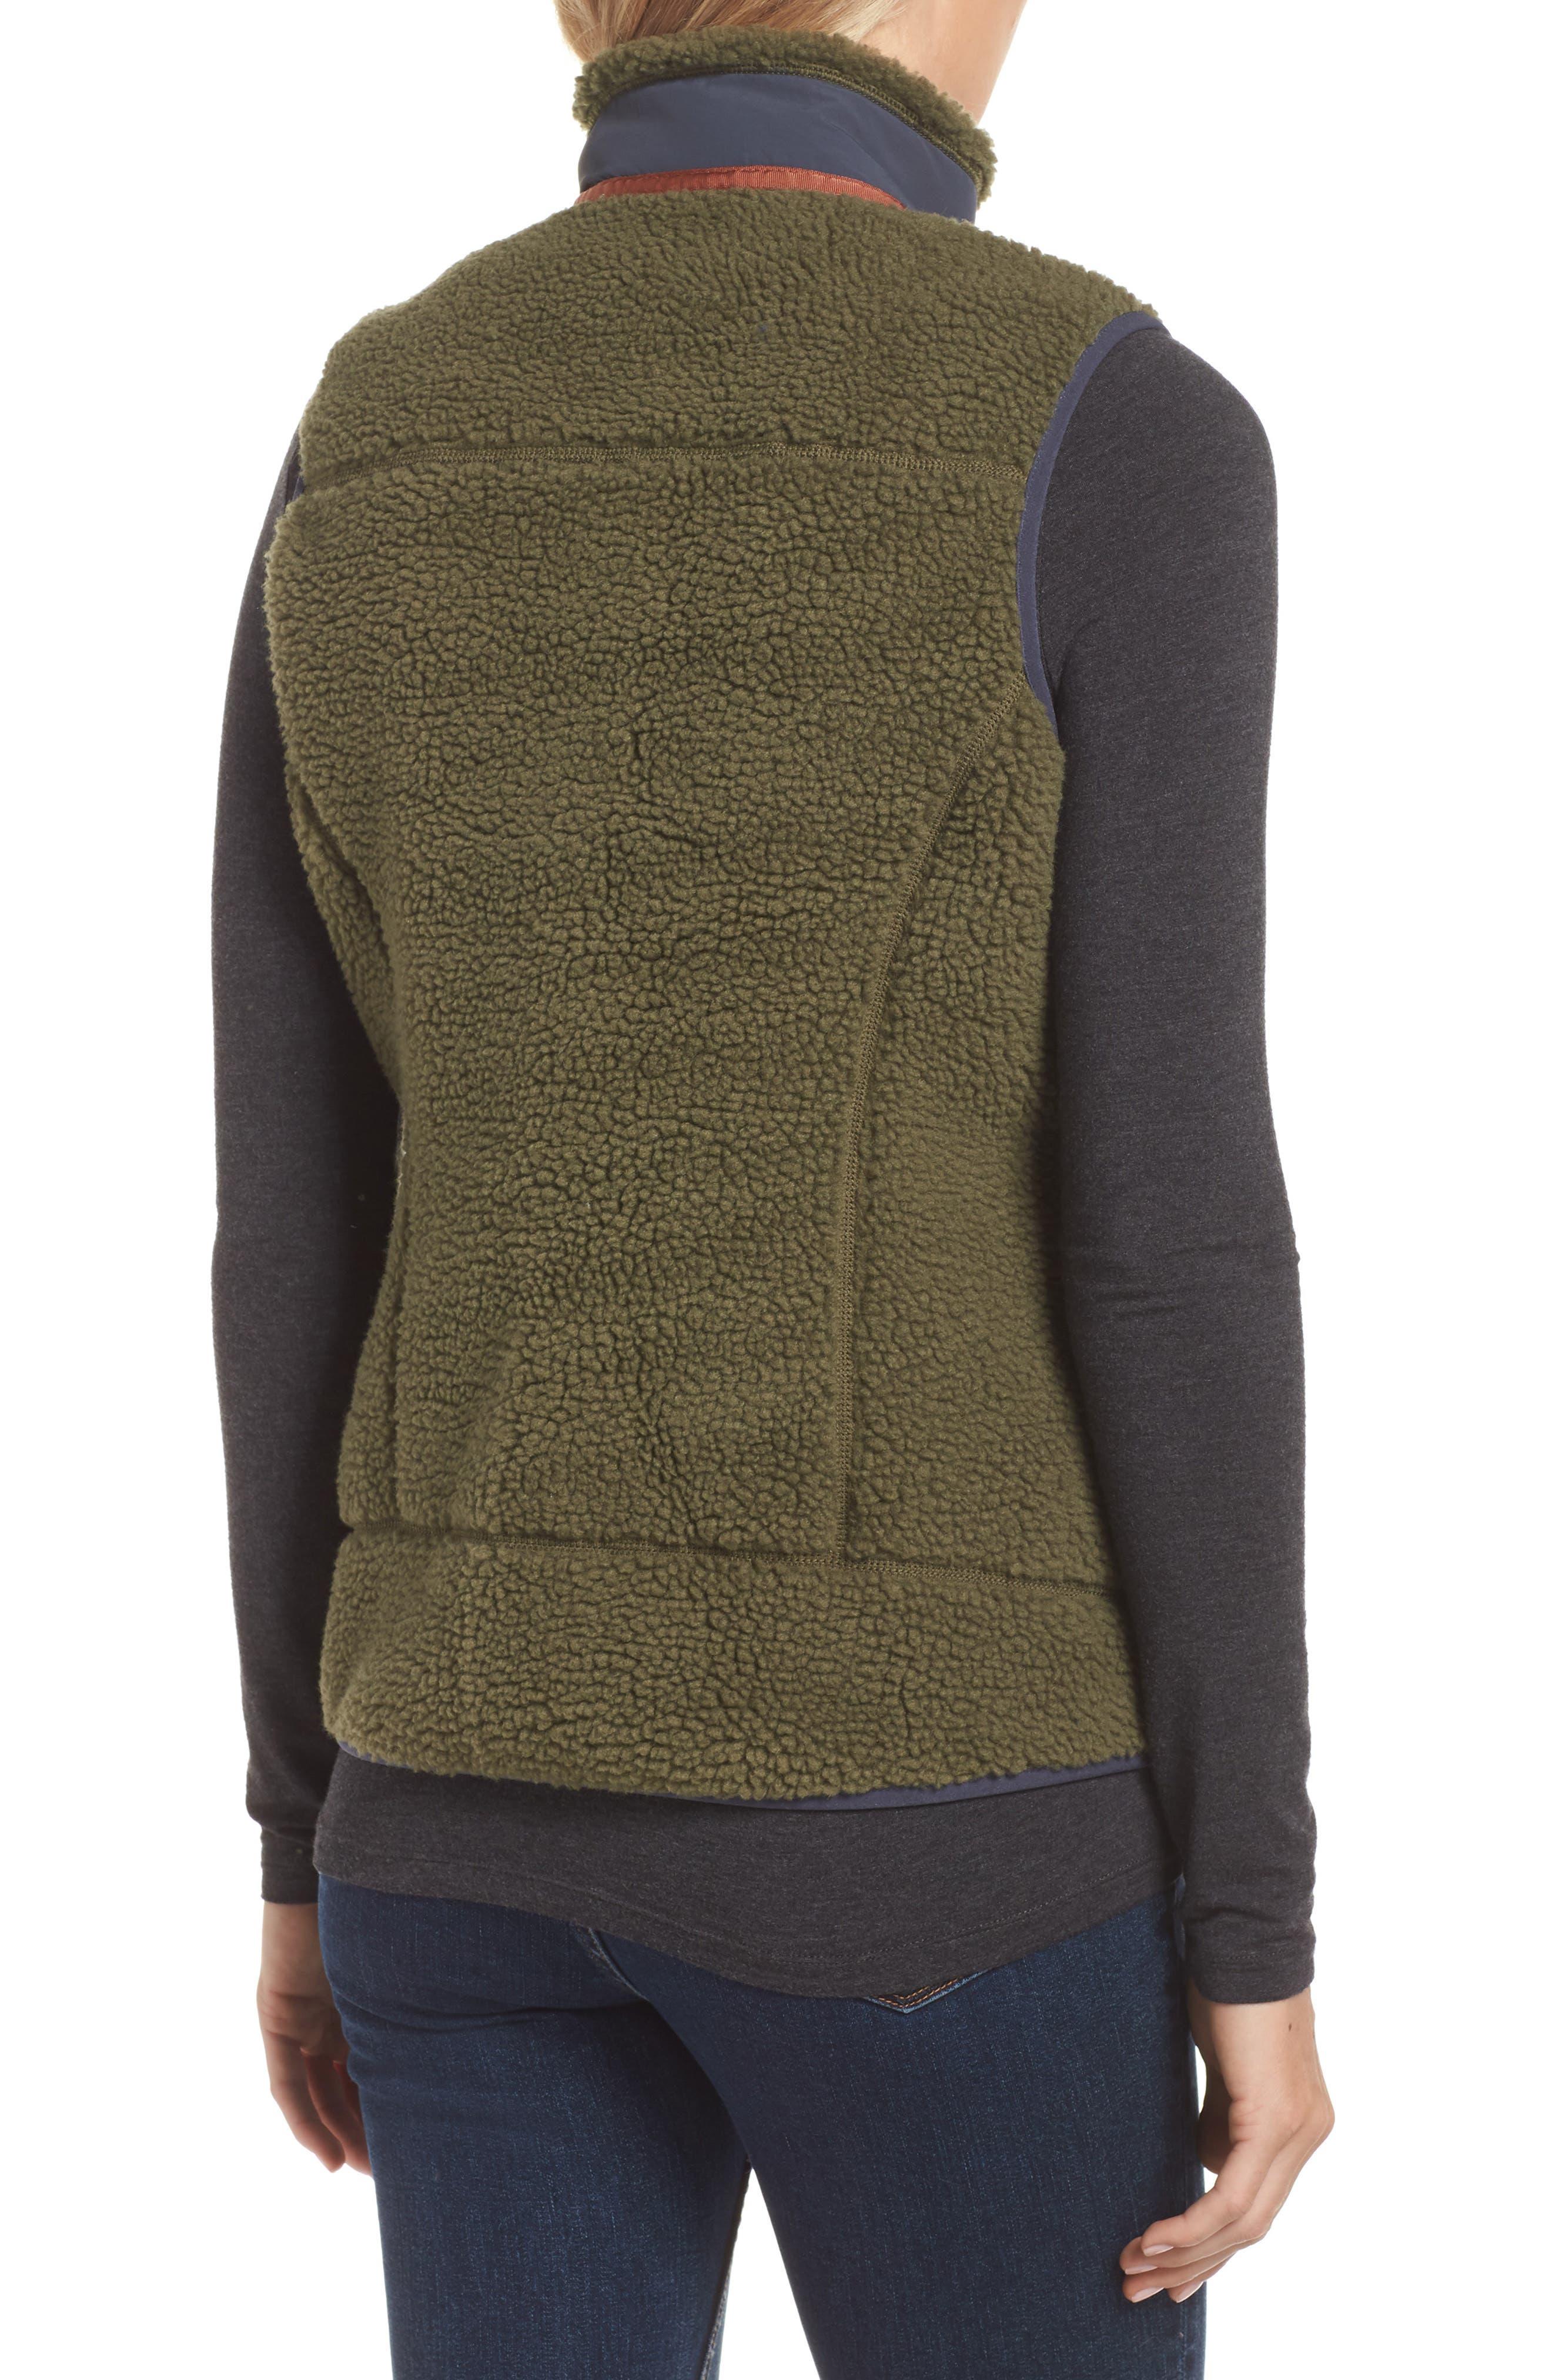 Classic Retro-X<sup>®</sup> Fleece Vest,                             Alternate thumbnail 2, color,                             FATIGUE GREEN